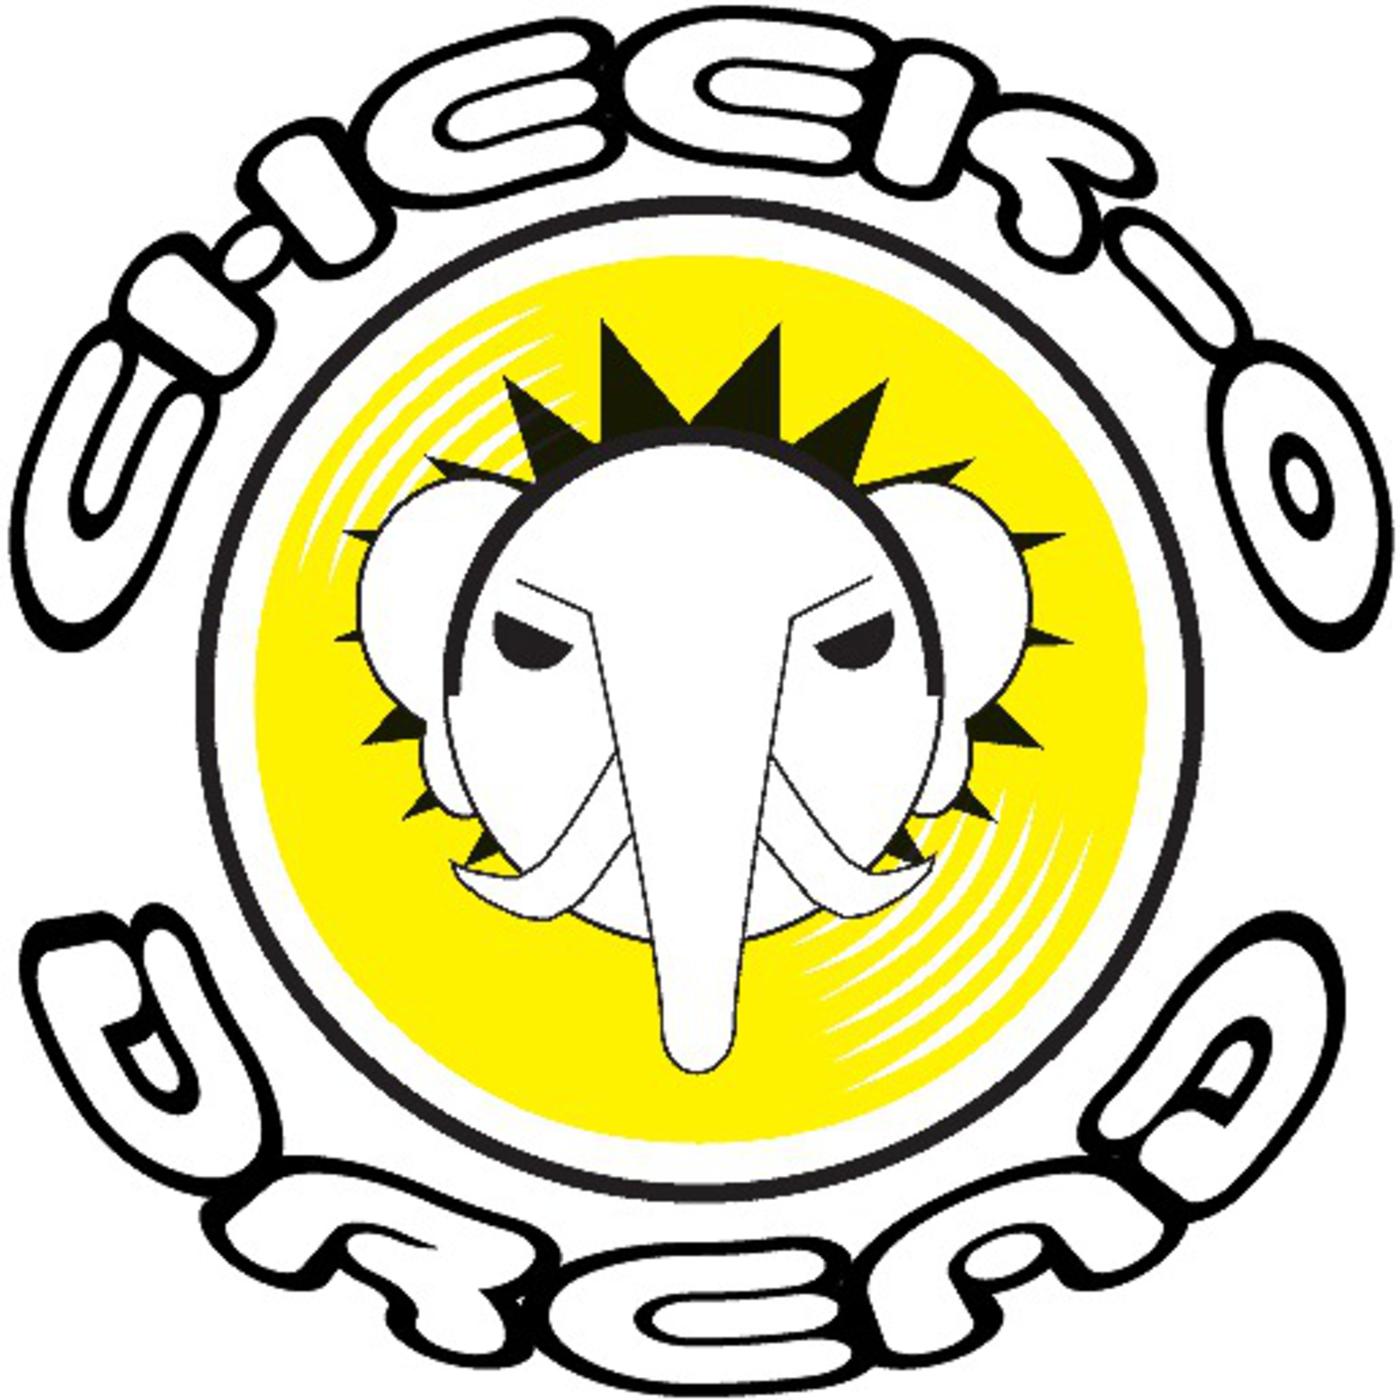 Cheek-O Dread's Podcast